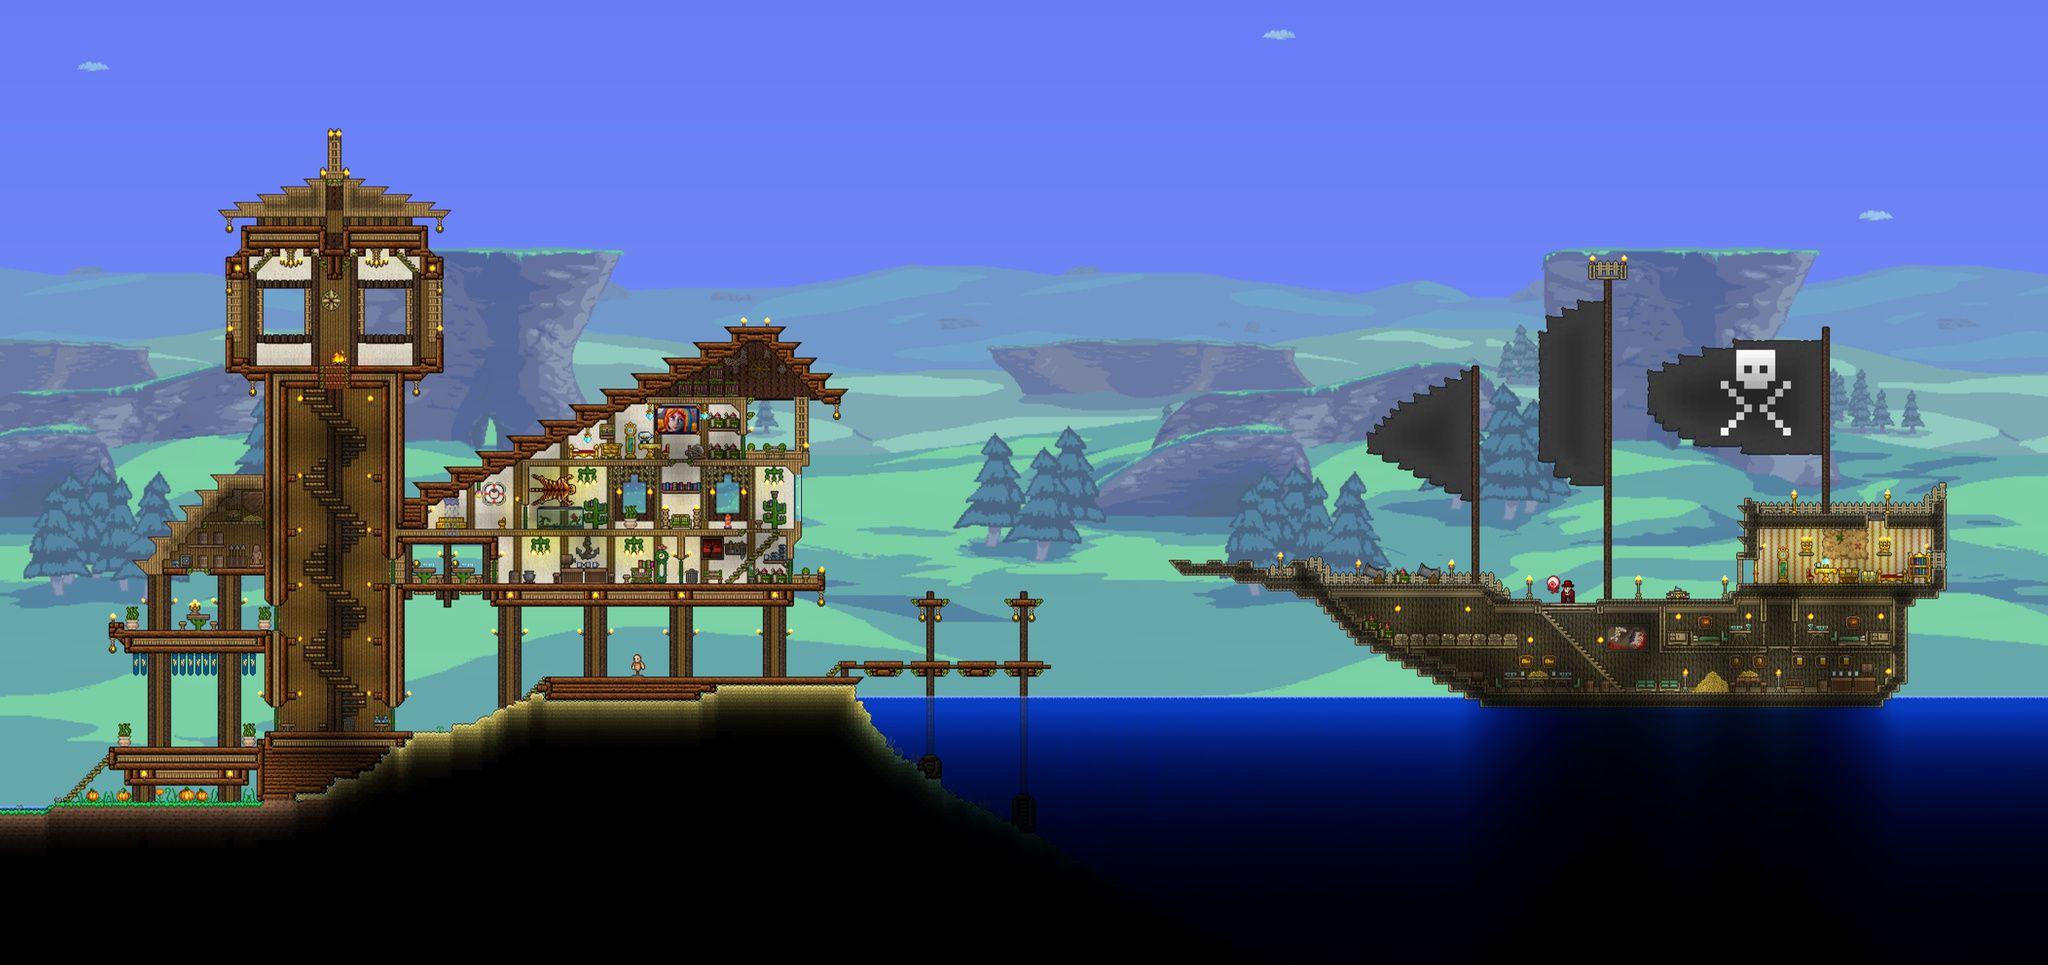 Top Wallpaper Minecraft Terraria - 36bd2826c093eb5d06b6443537252ea2  Perfect Image Reference_216772.jpg